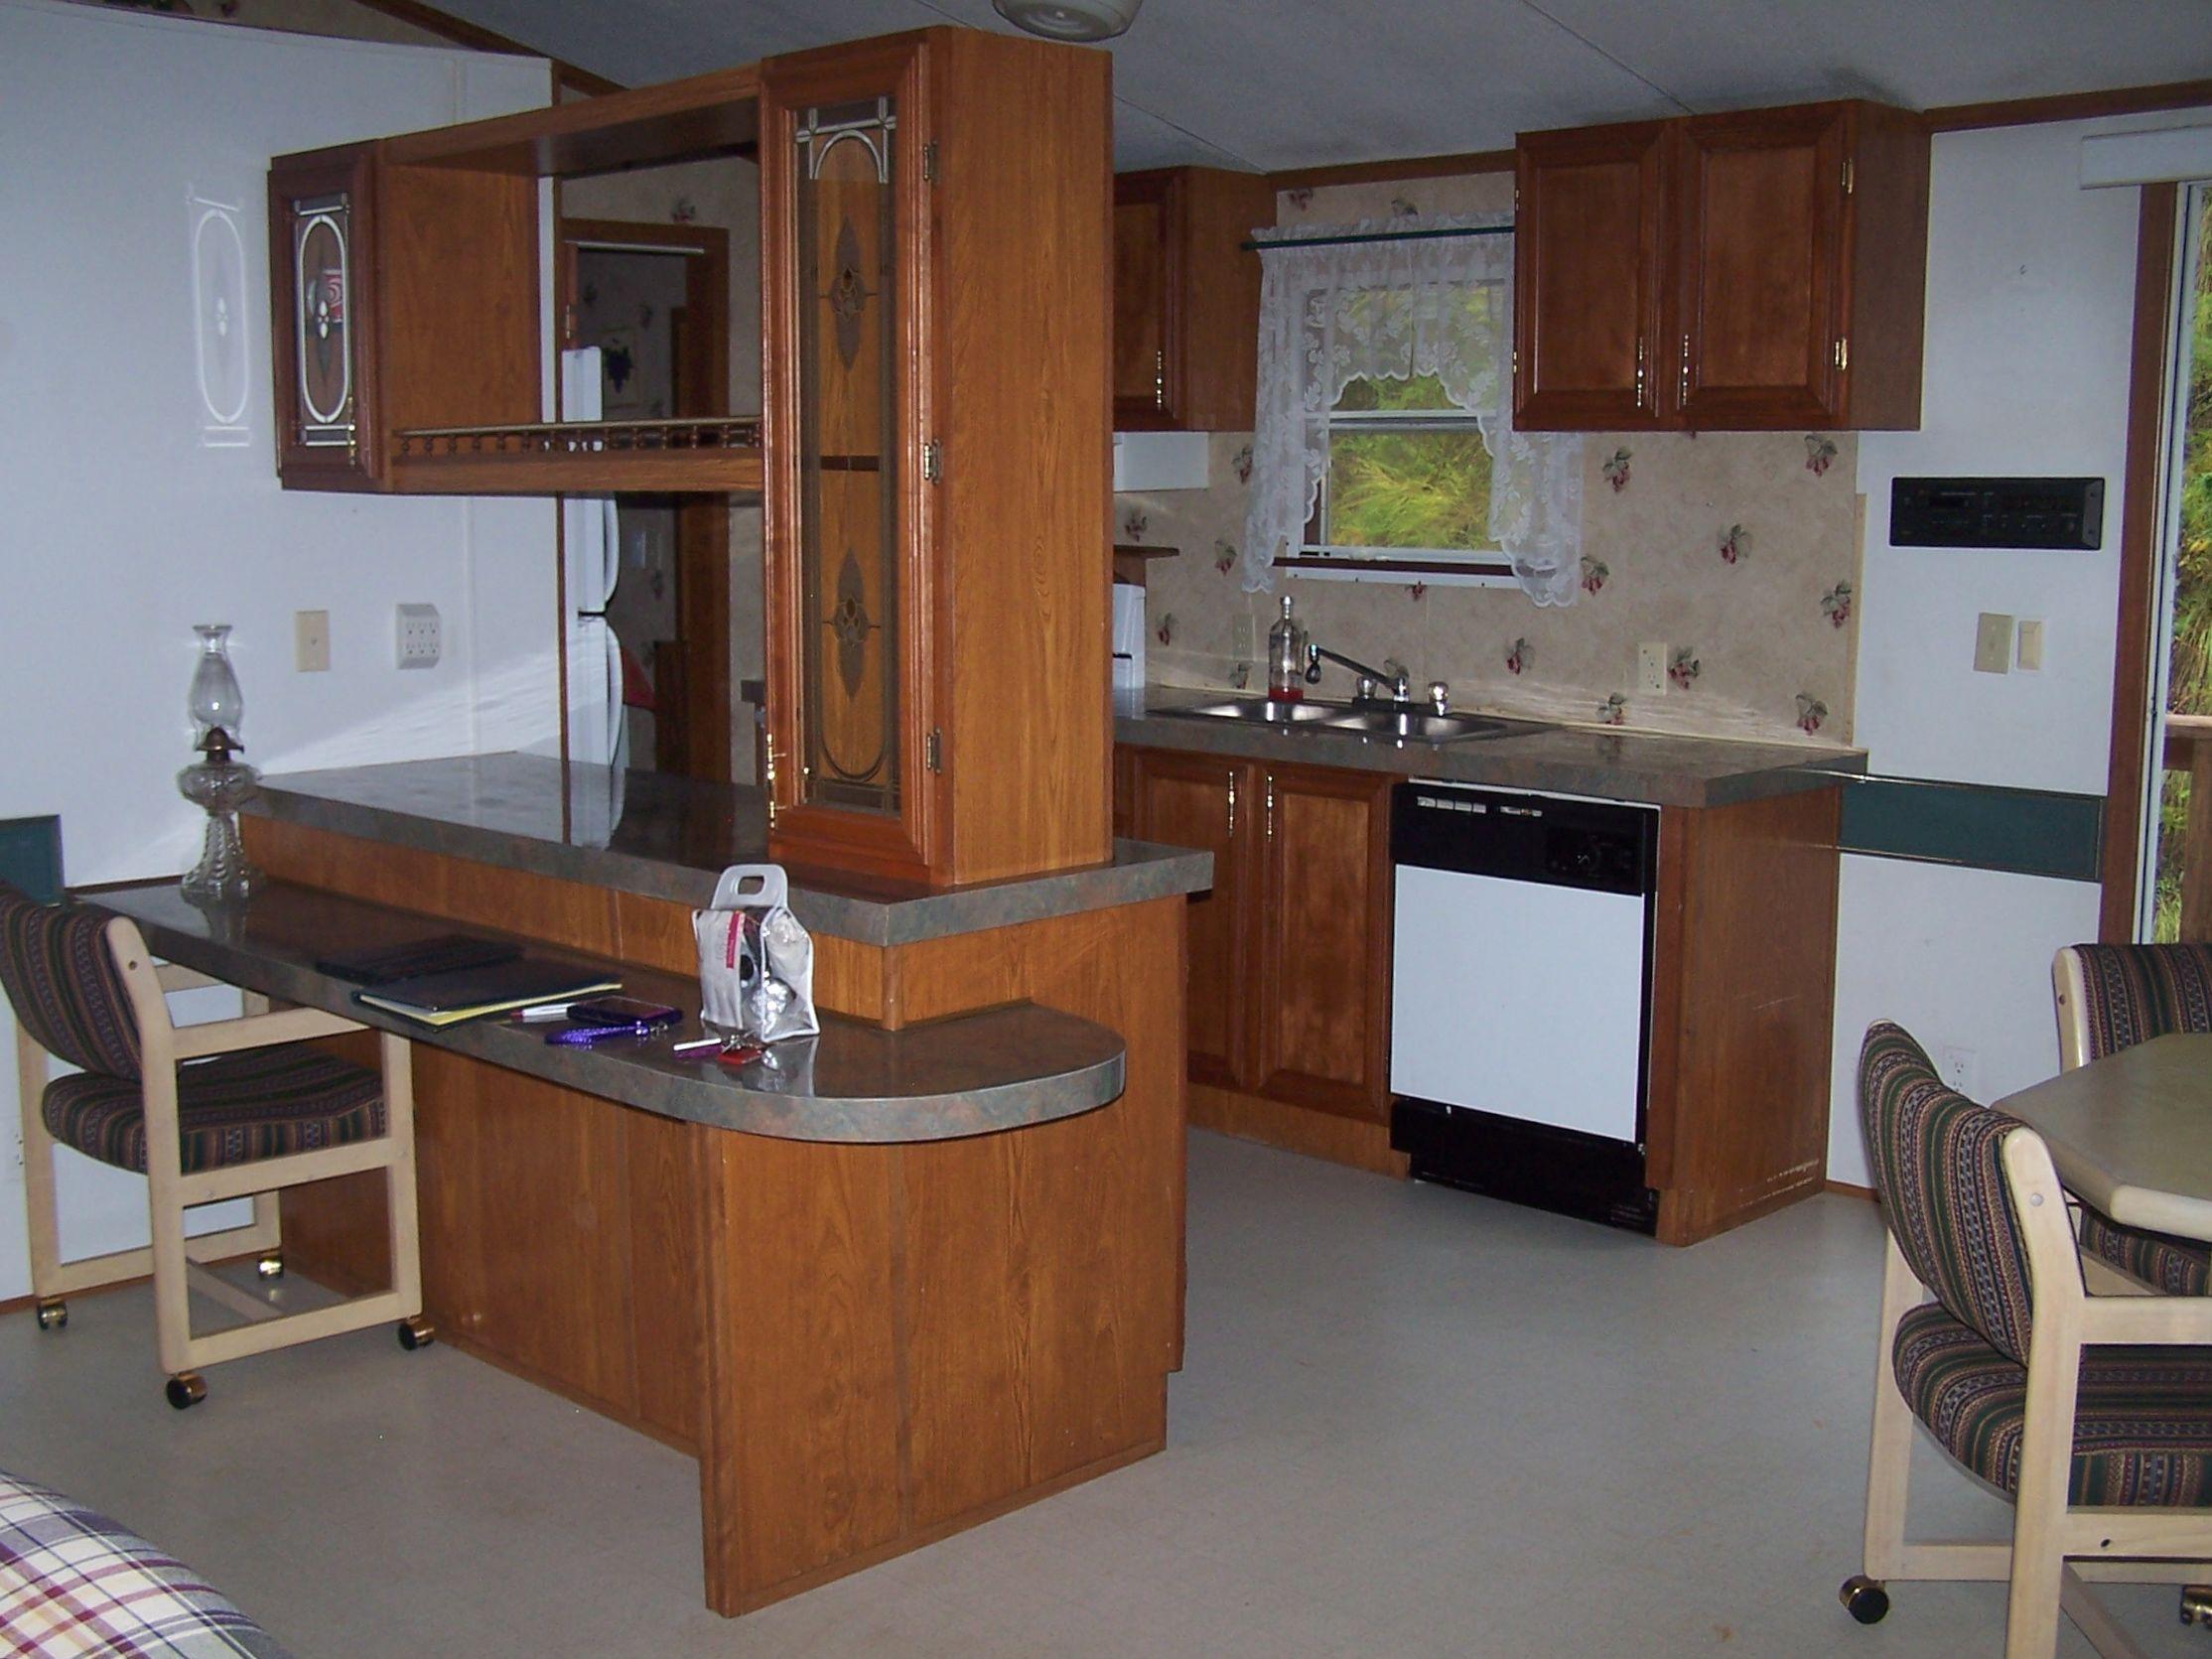 Wrens Kitchens Stevenage Wren kitchen, Kitchen design